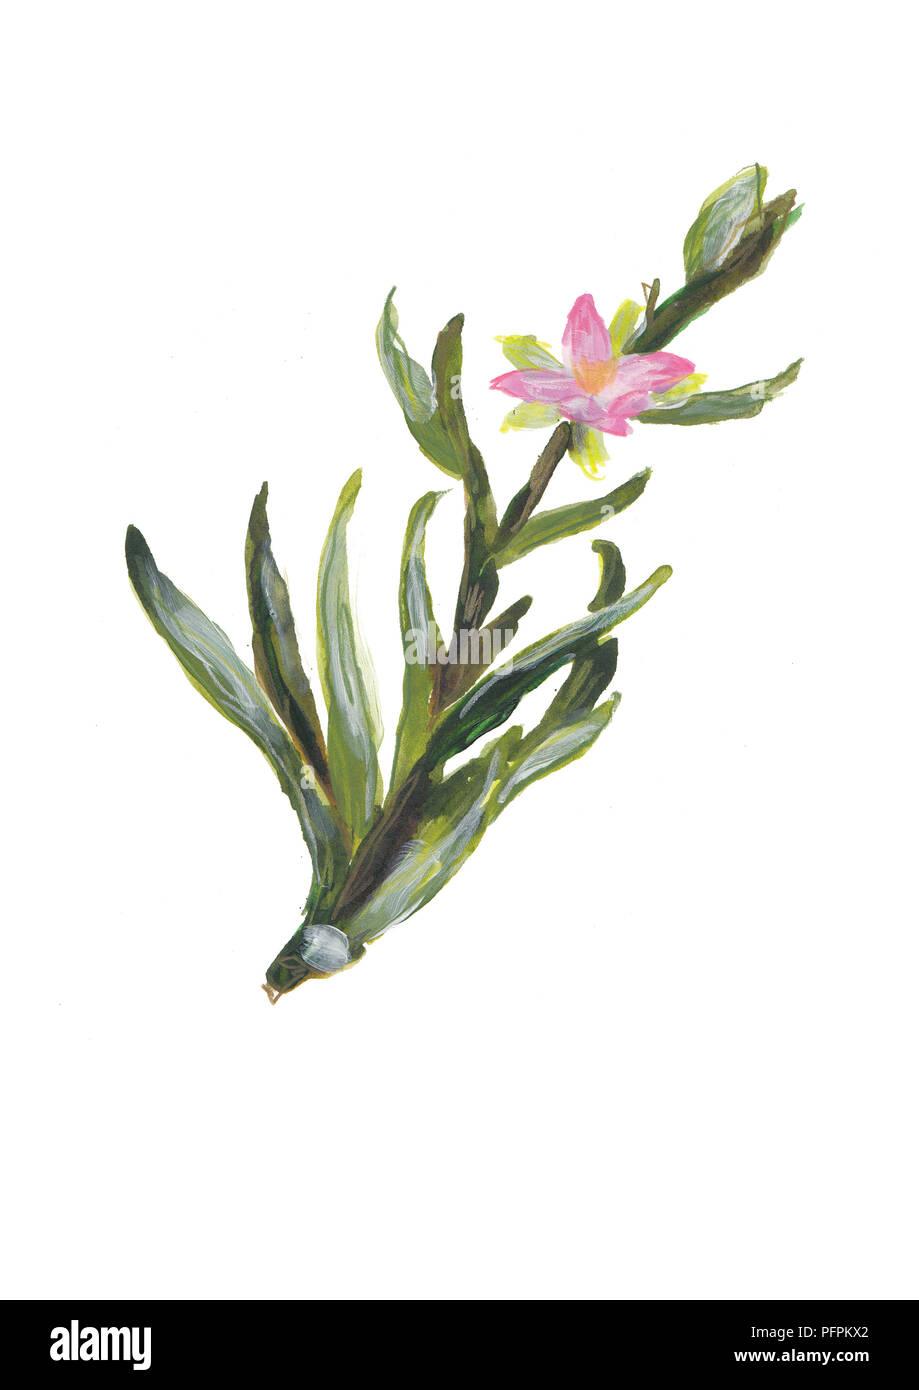 Sea spurrey flowers - Stock Image